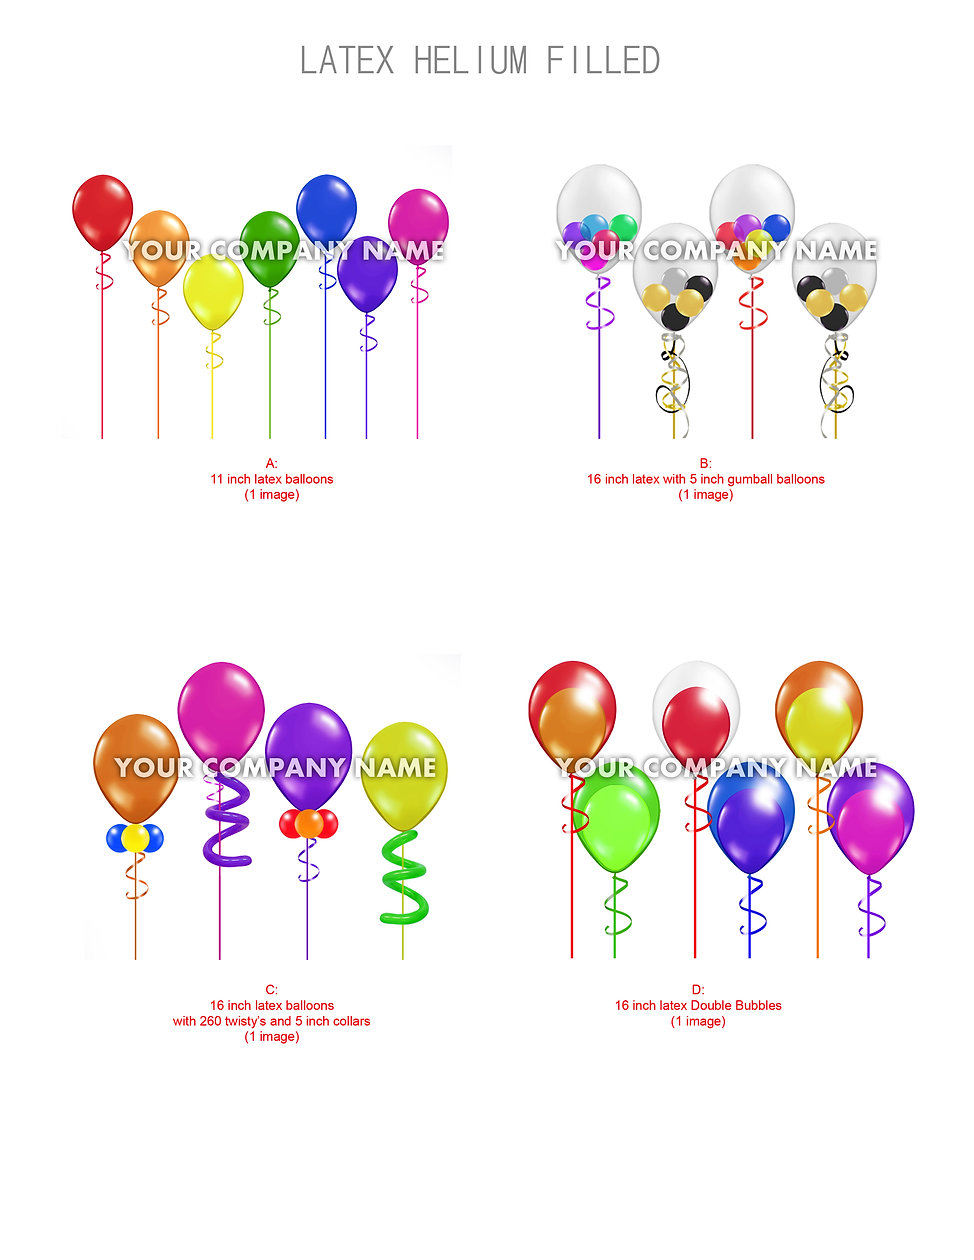 All Latex Helium copy.jpg